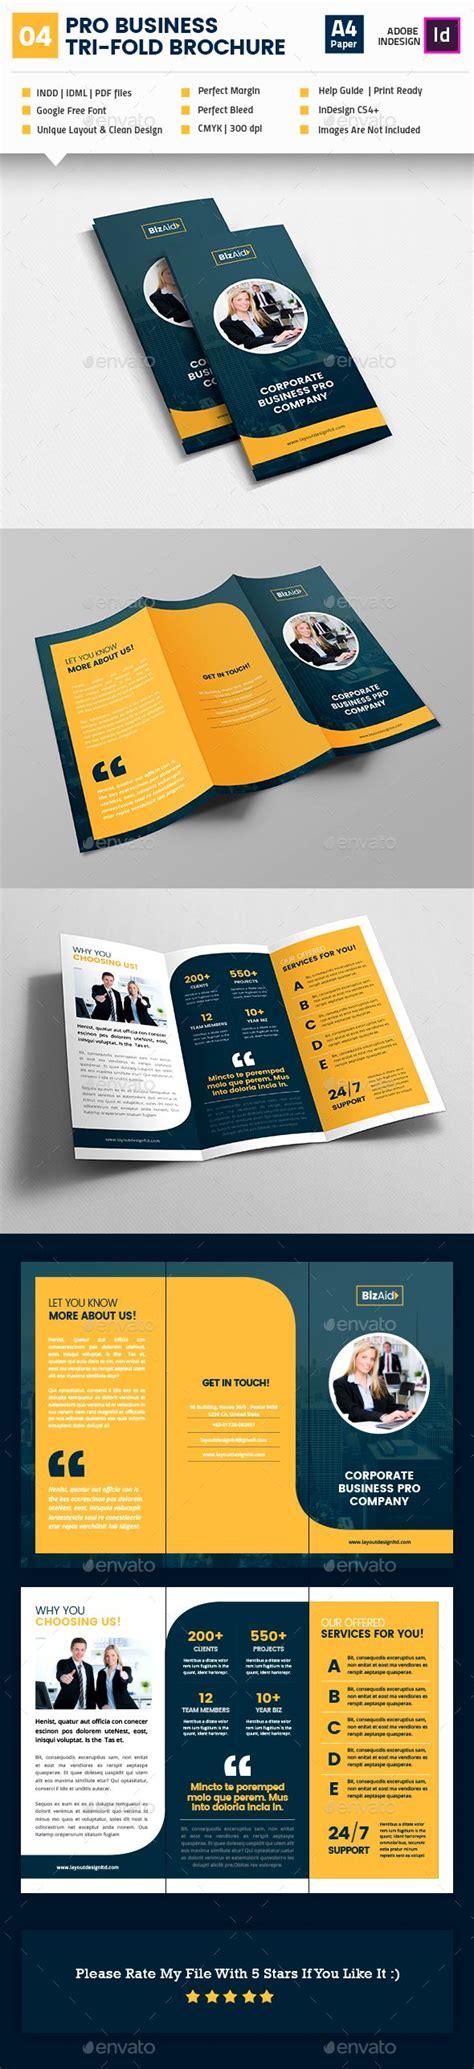 brochure layout sles ideas 25 best ideas about brochure design on pinterest